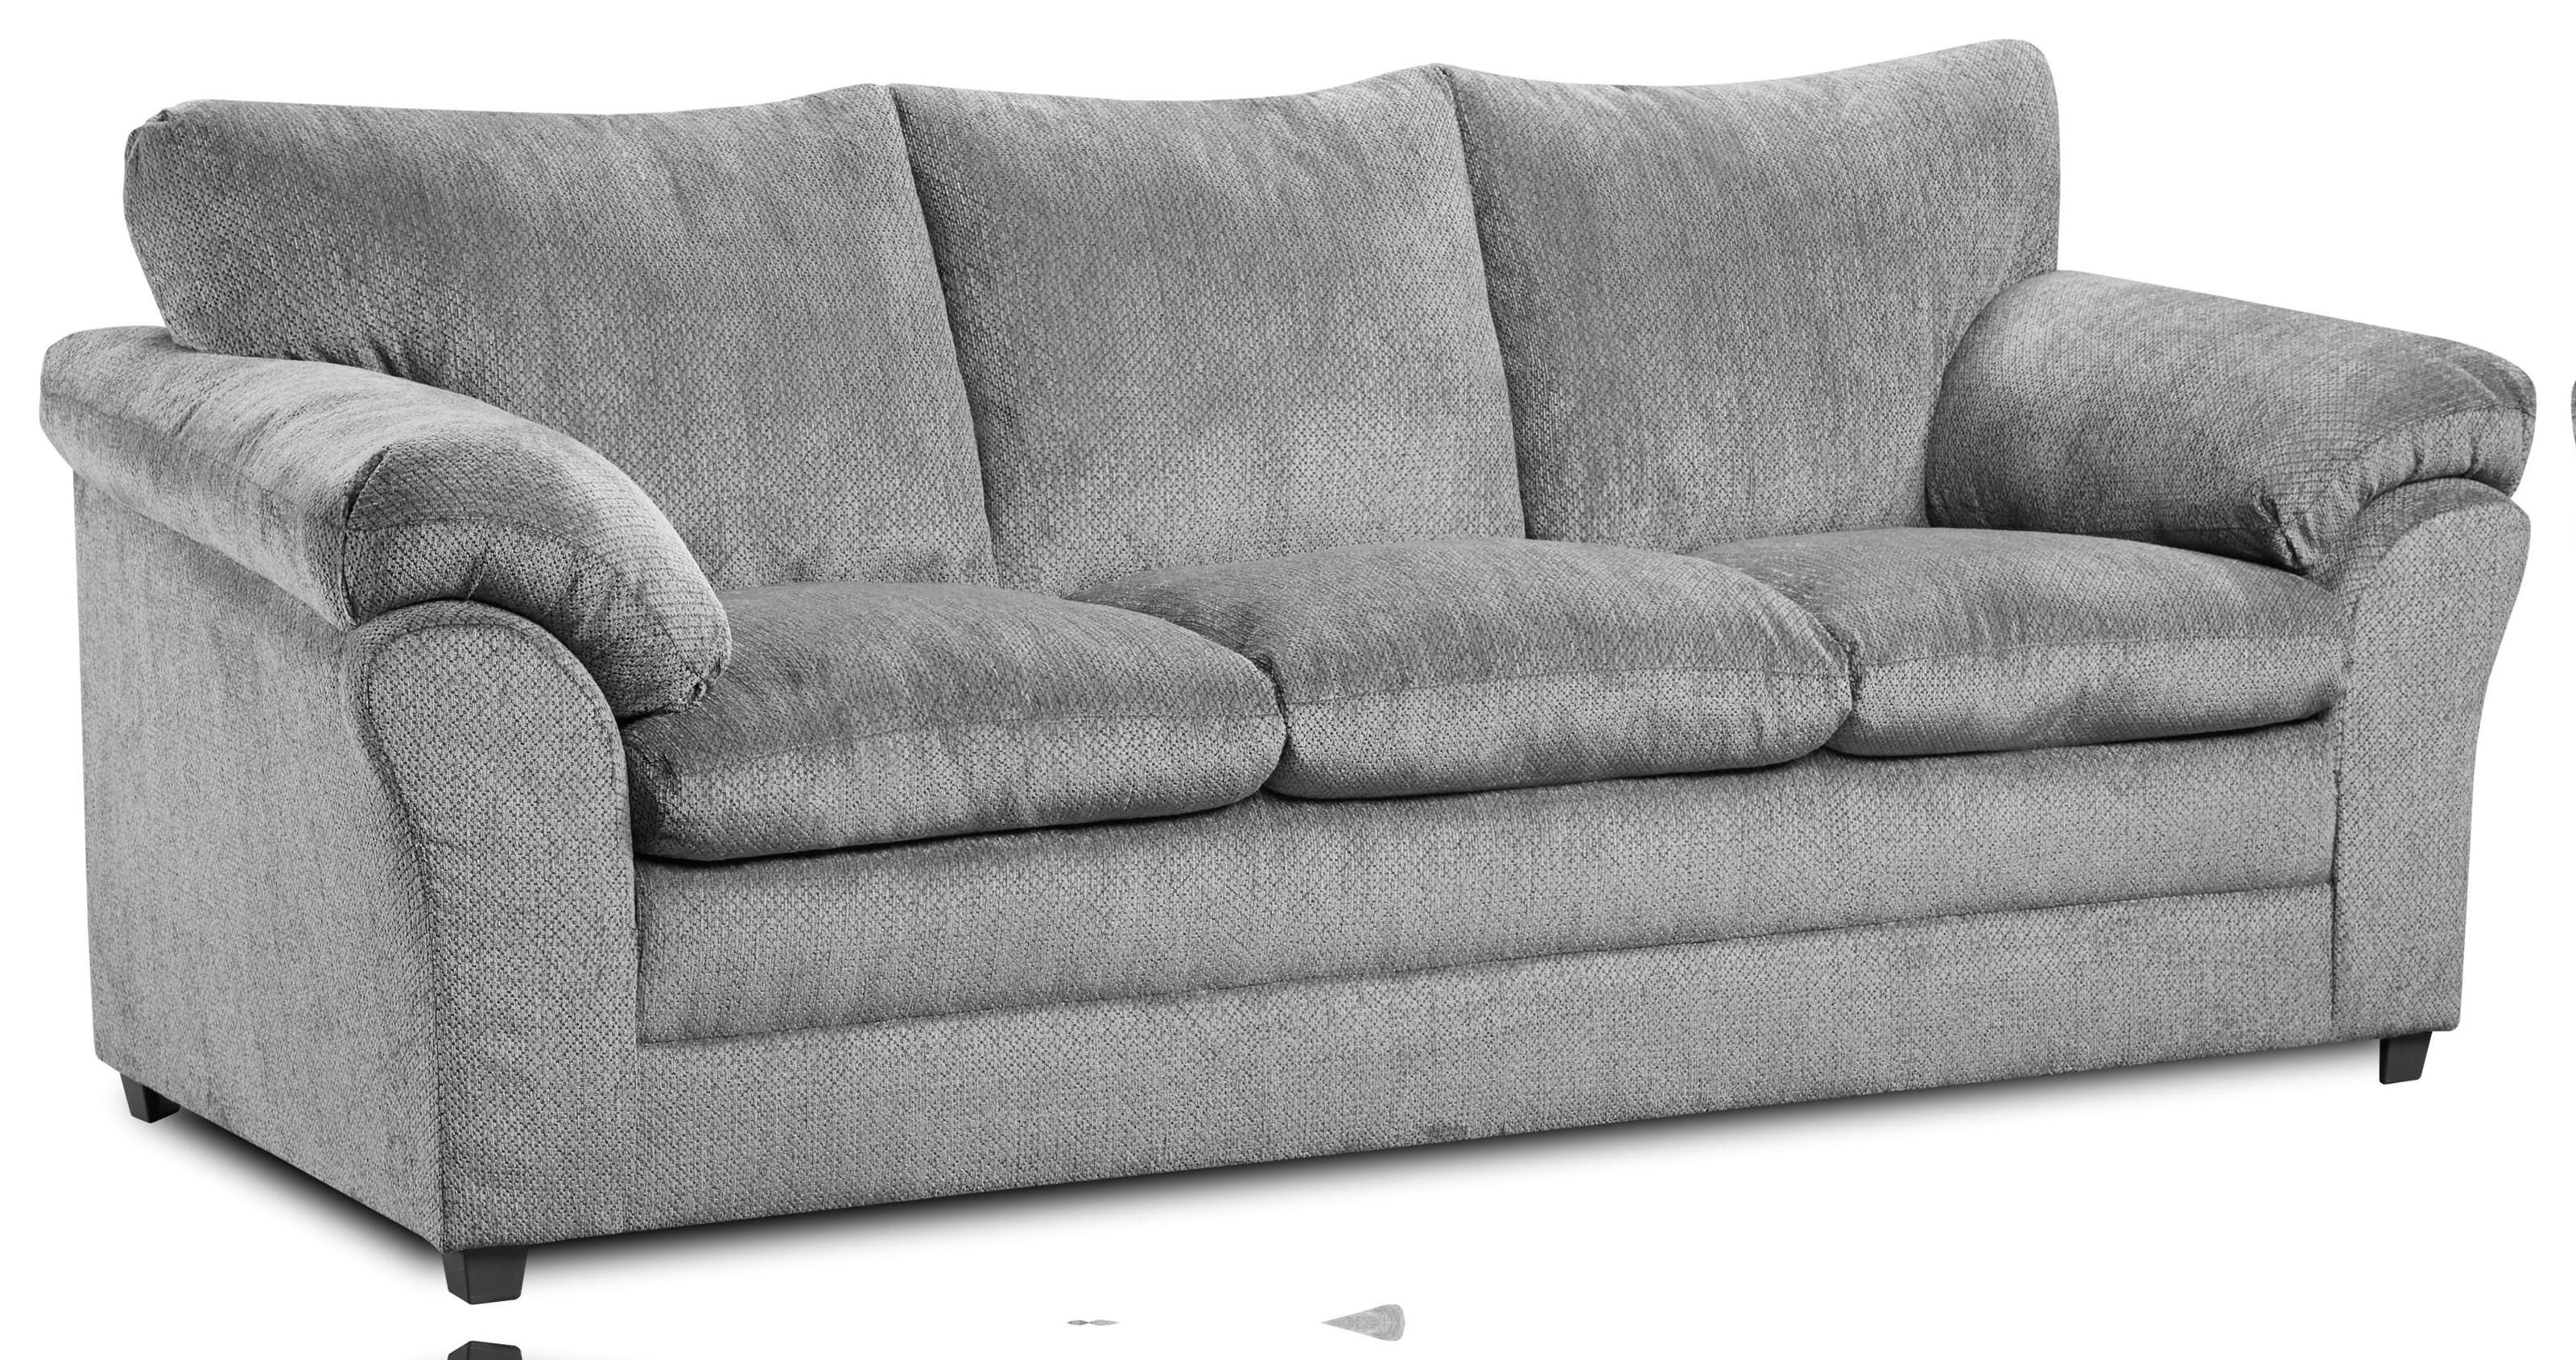 2153 Kennedy Grey Three Cushion Sofa by Washington Brothers Furniture at Furniture Fair - North Carolina